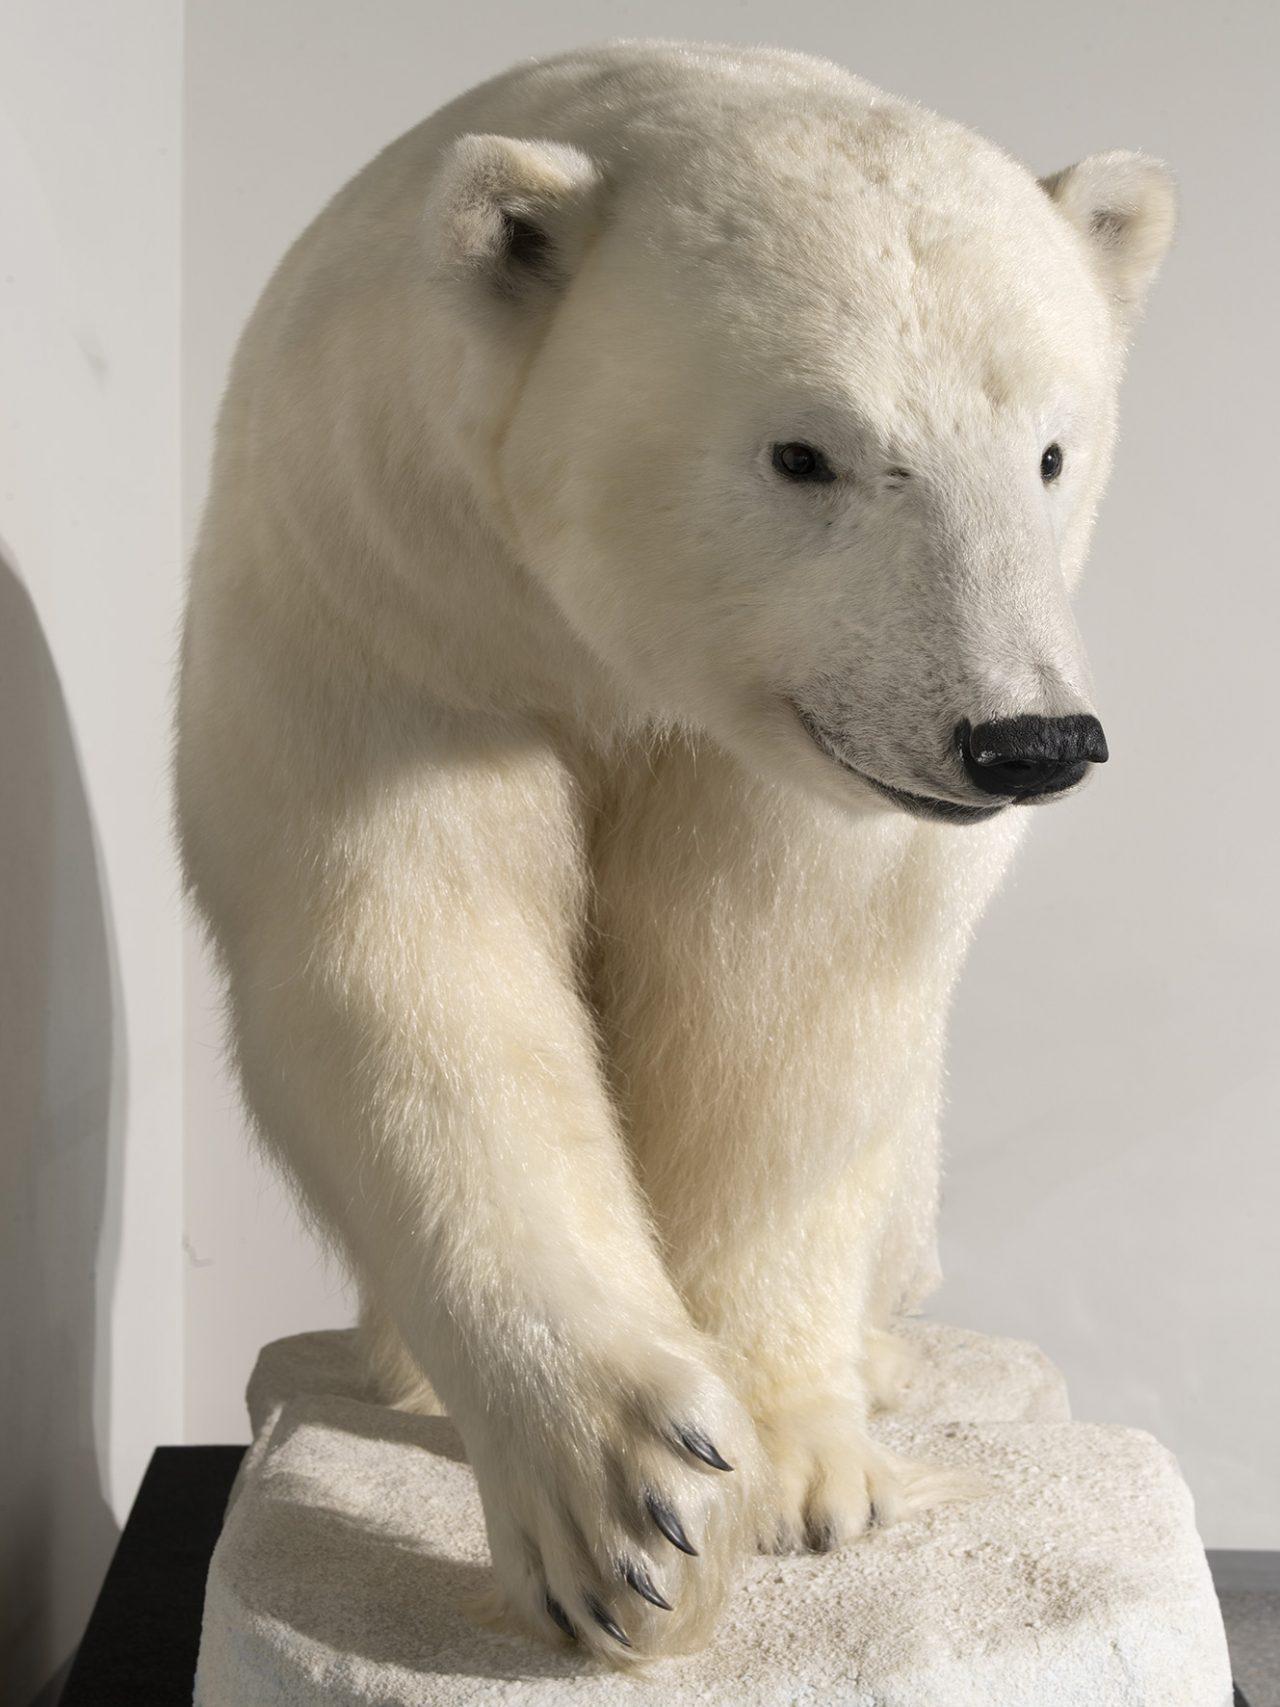 Utstilt isbjørn, Rana museum